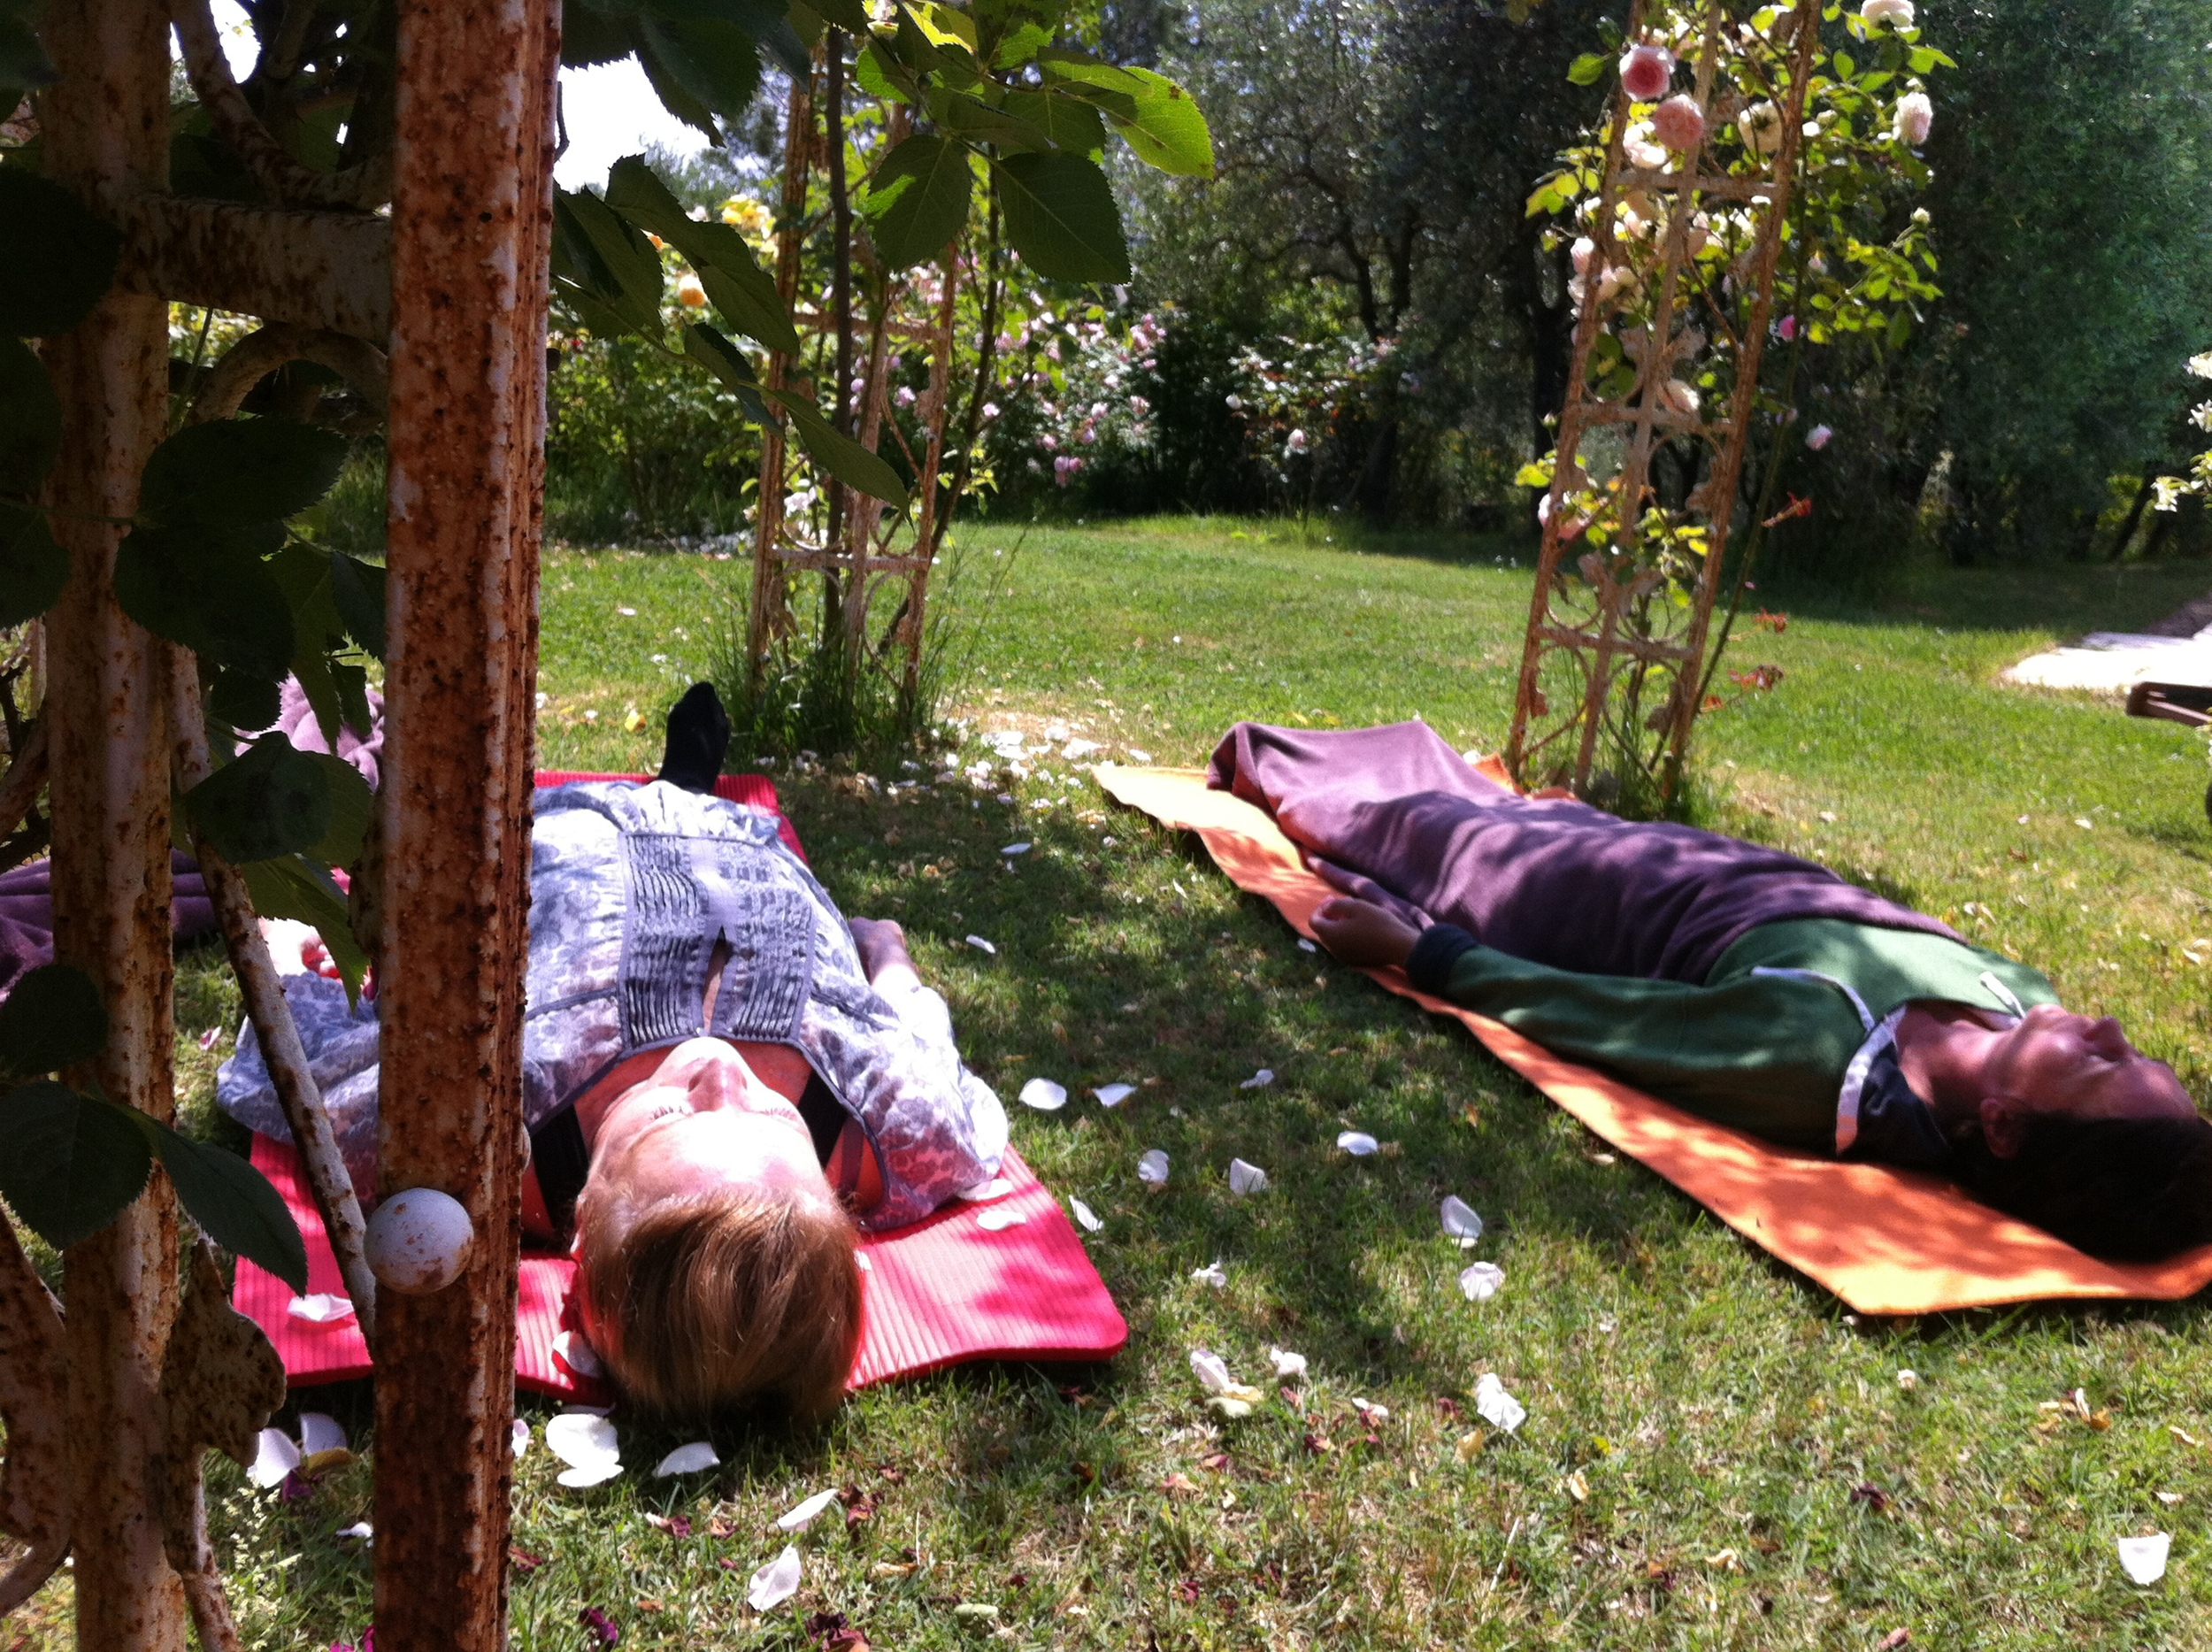 Yoga Nidra under the rose arches